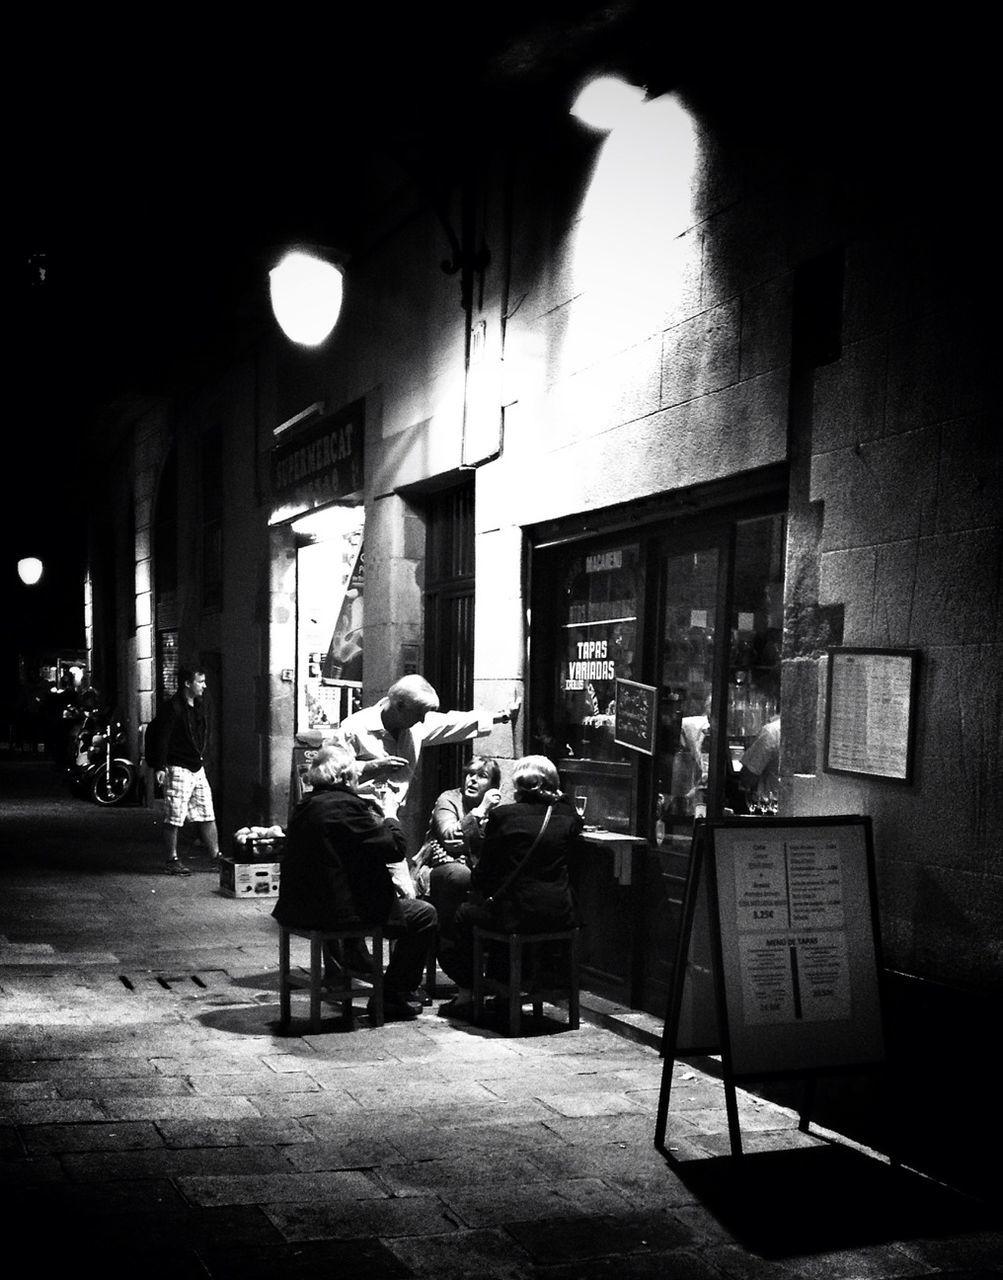 People at sidewalk cafe